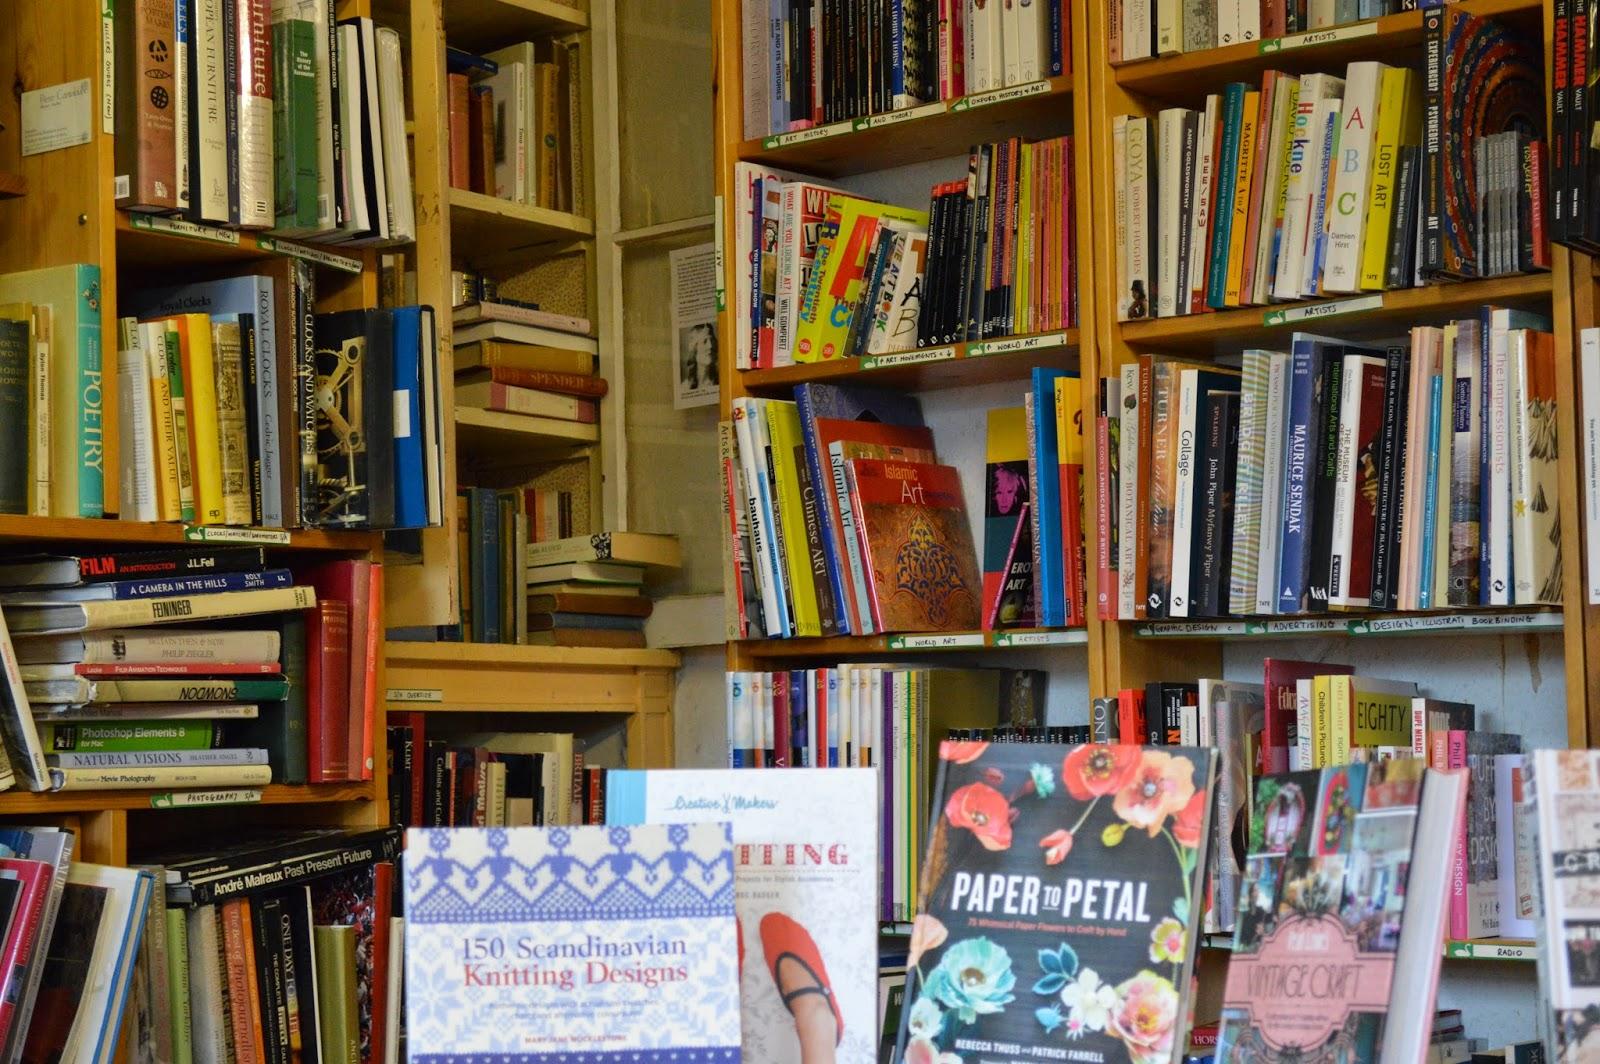 Scarthin Books, bookshop, photos, photographs, new, second hand, cute, independent, shelves, bibliophile, shopping, Matlock, Cromford